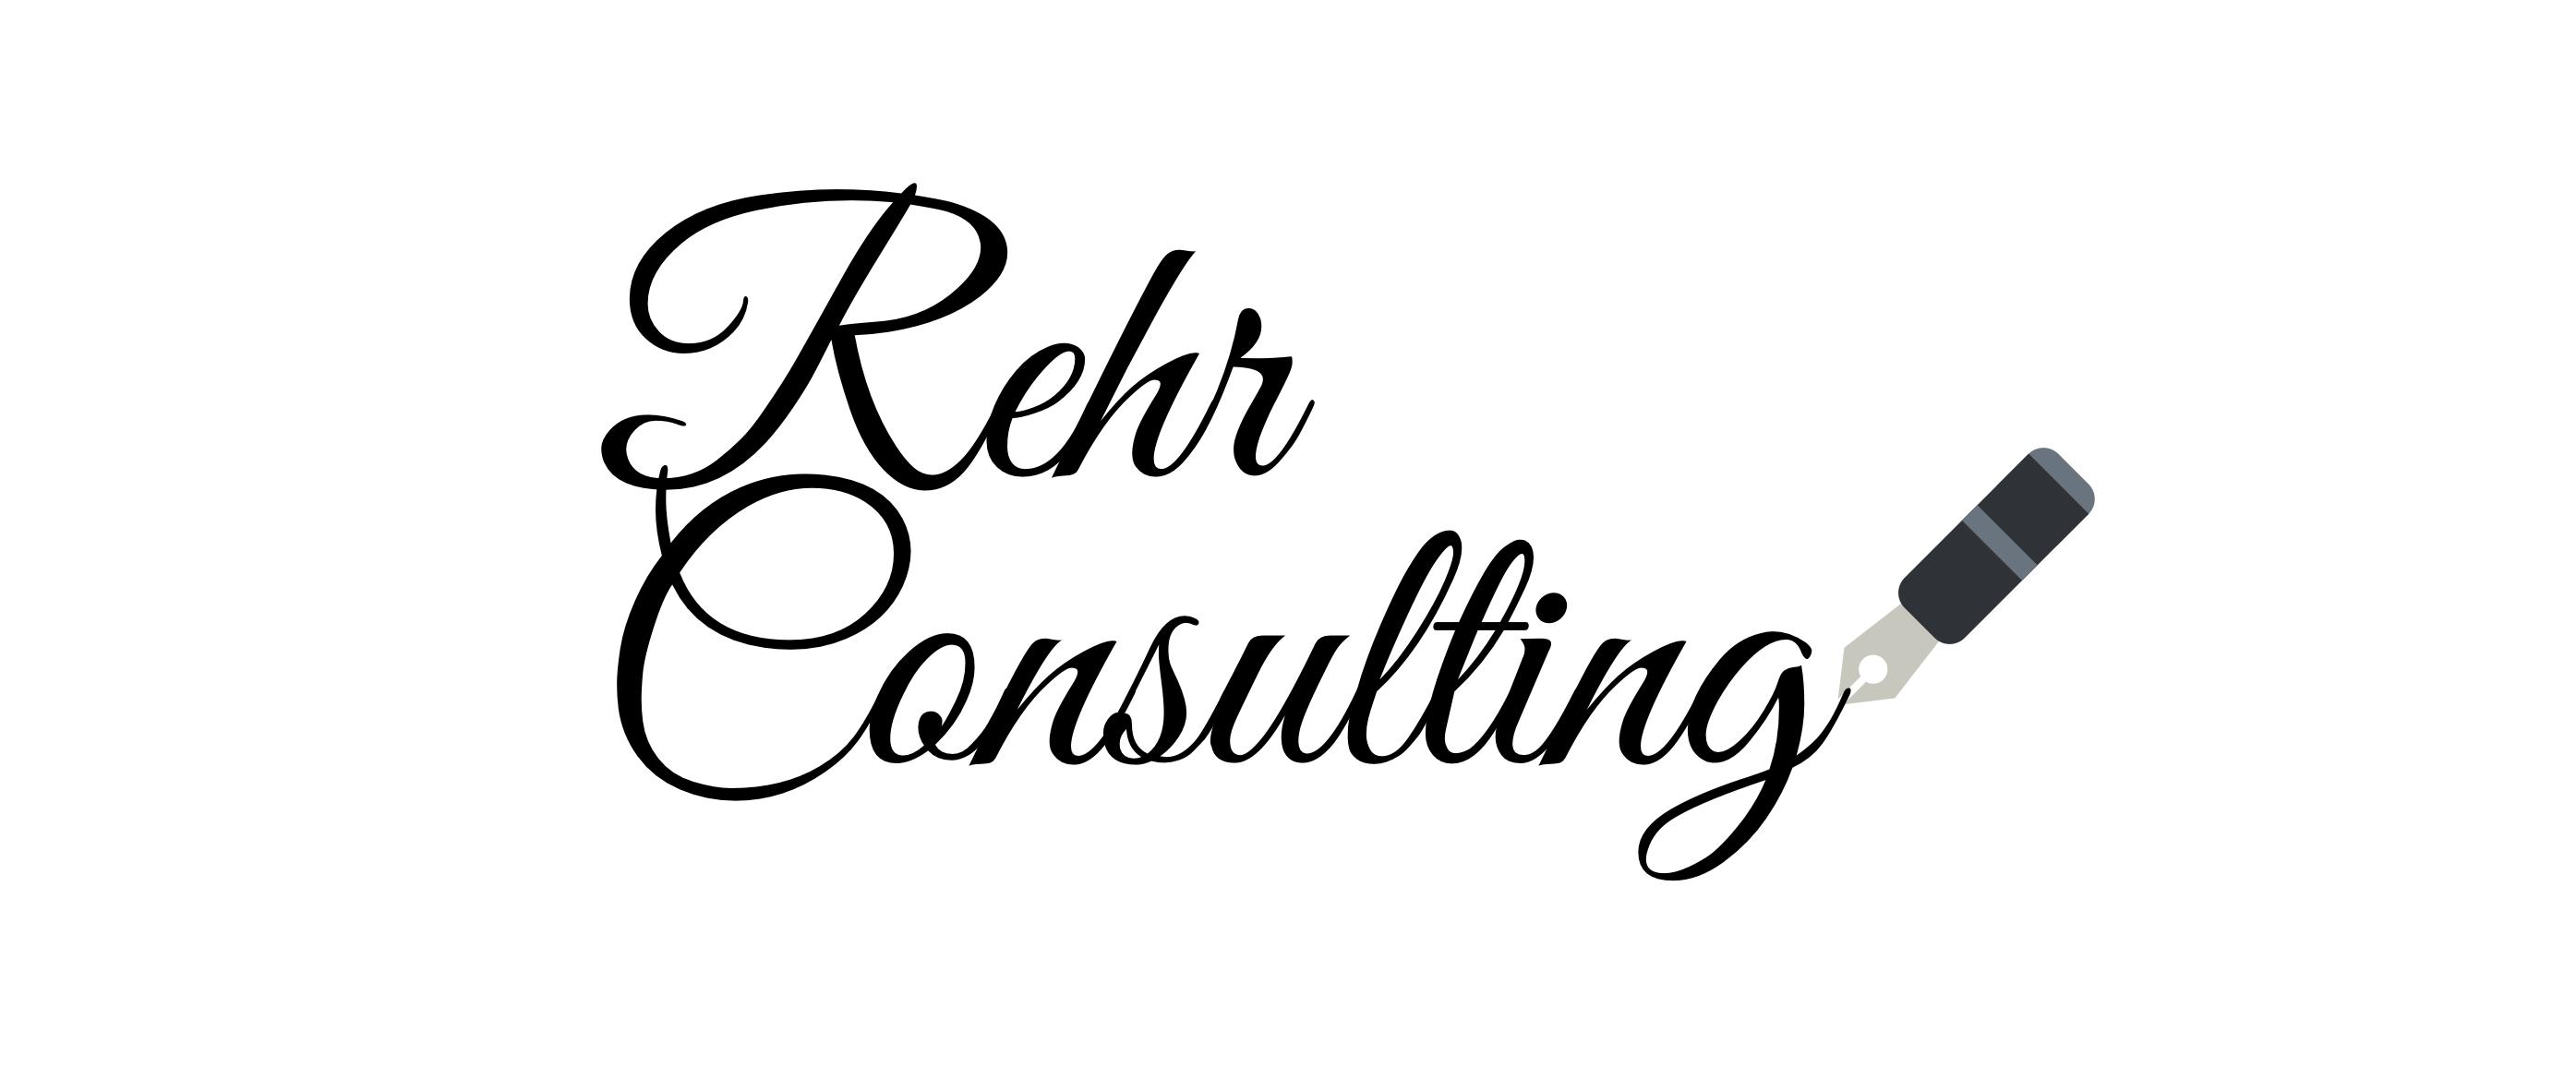 Rehr Consulting